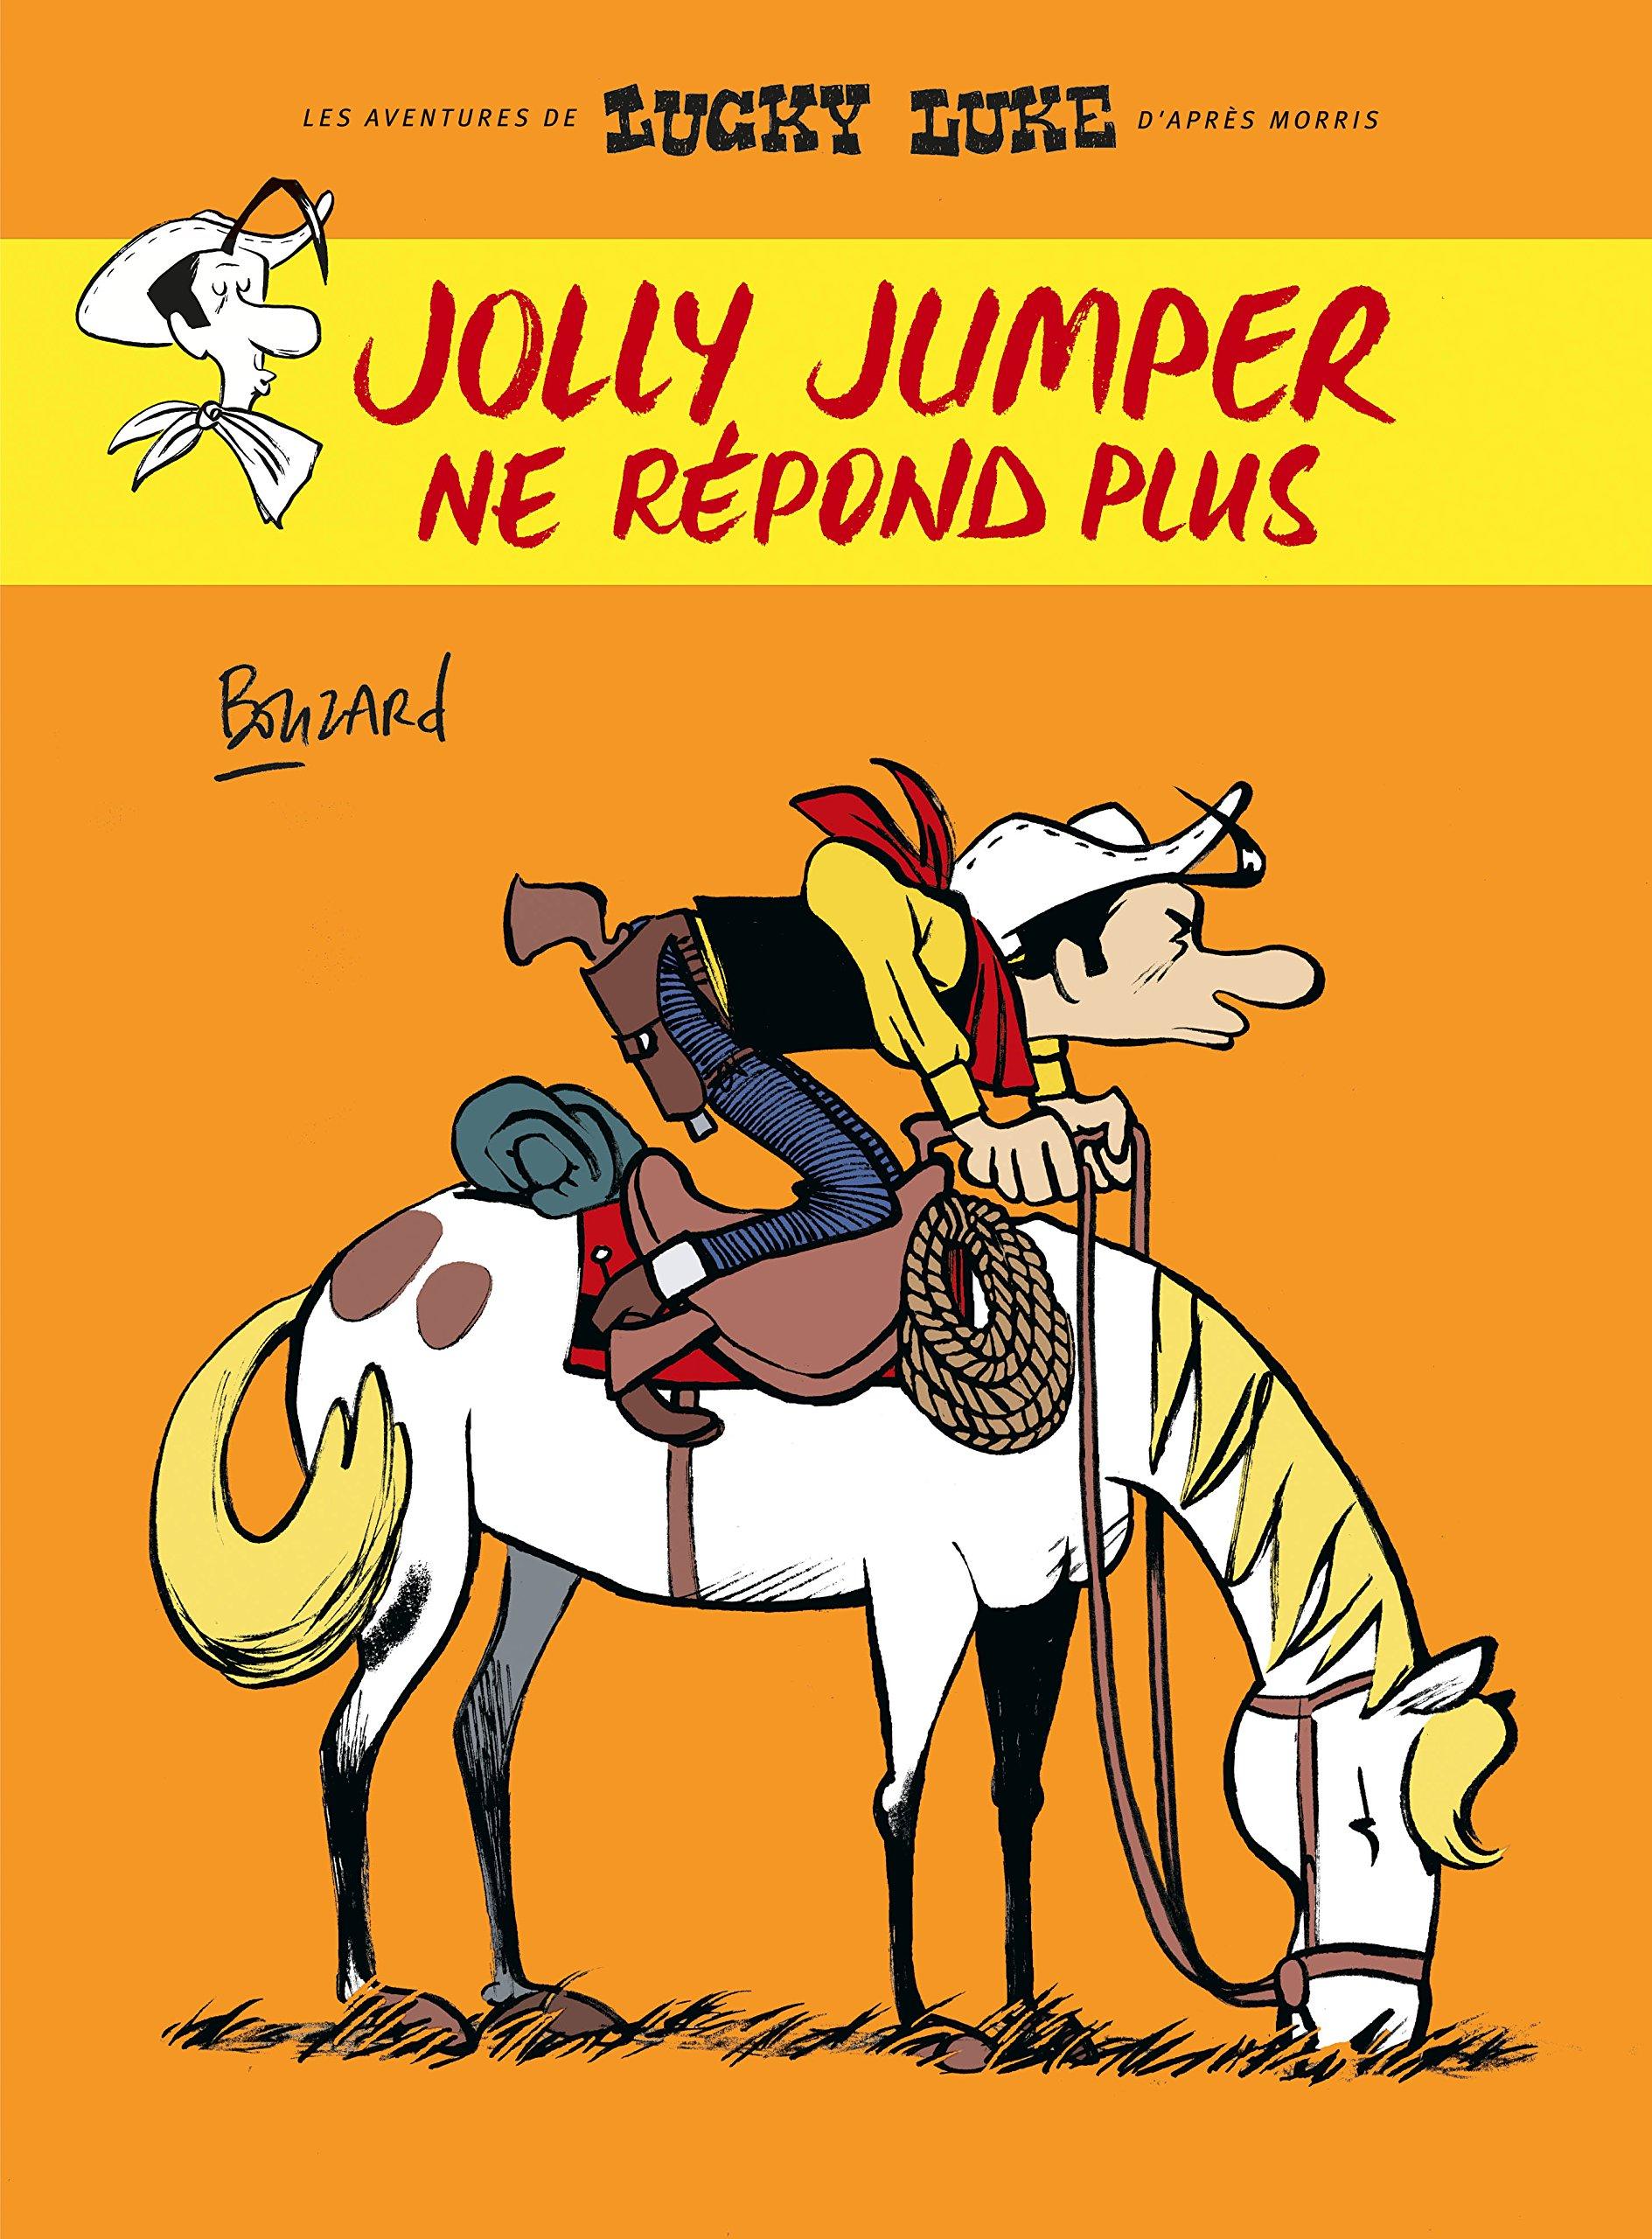 Jolly jumper ne répond plus 1 - Jolly Jumper ne répond plus